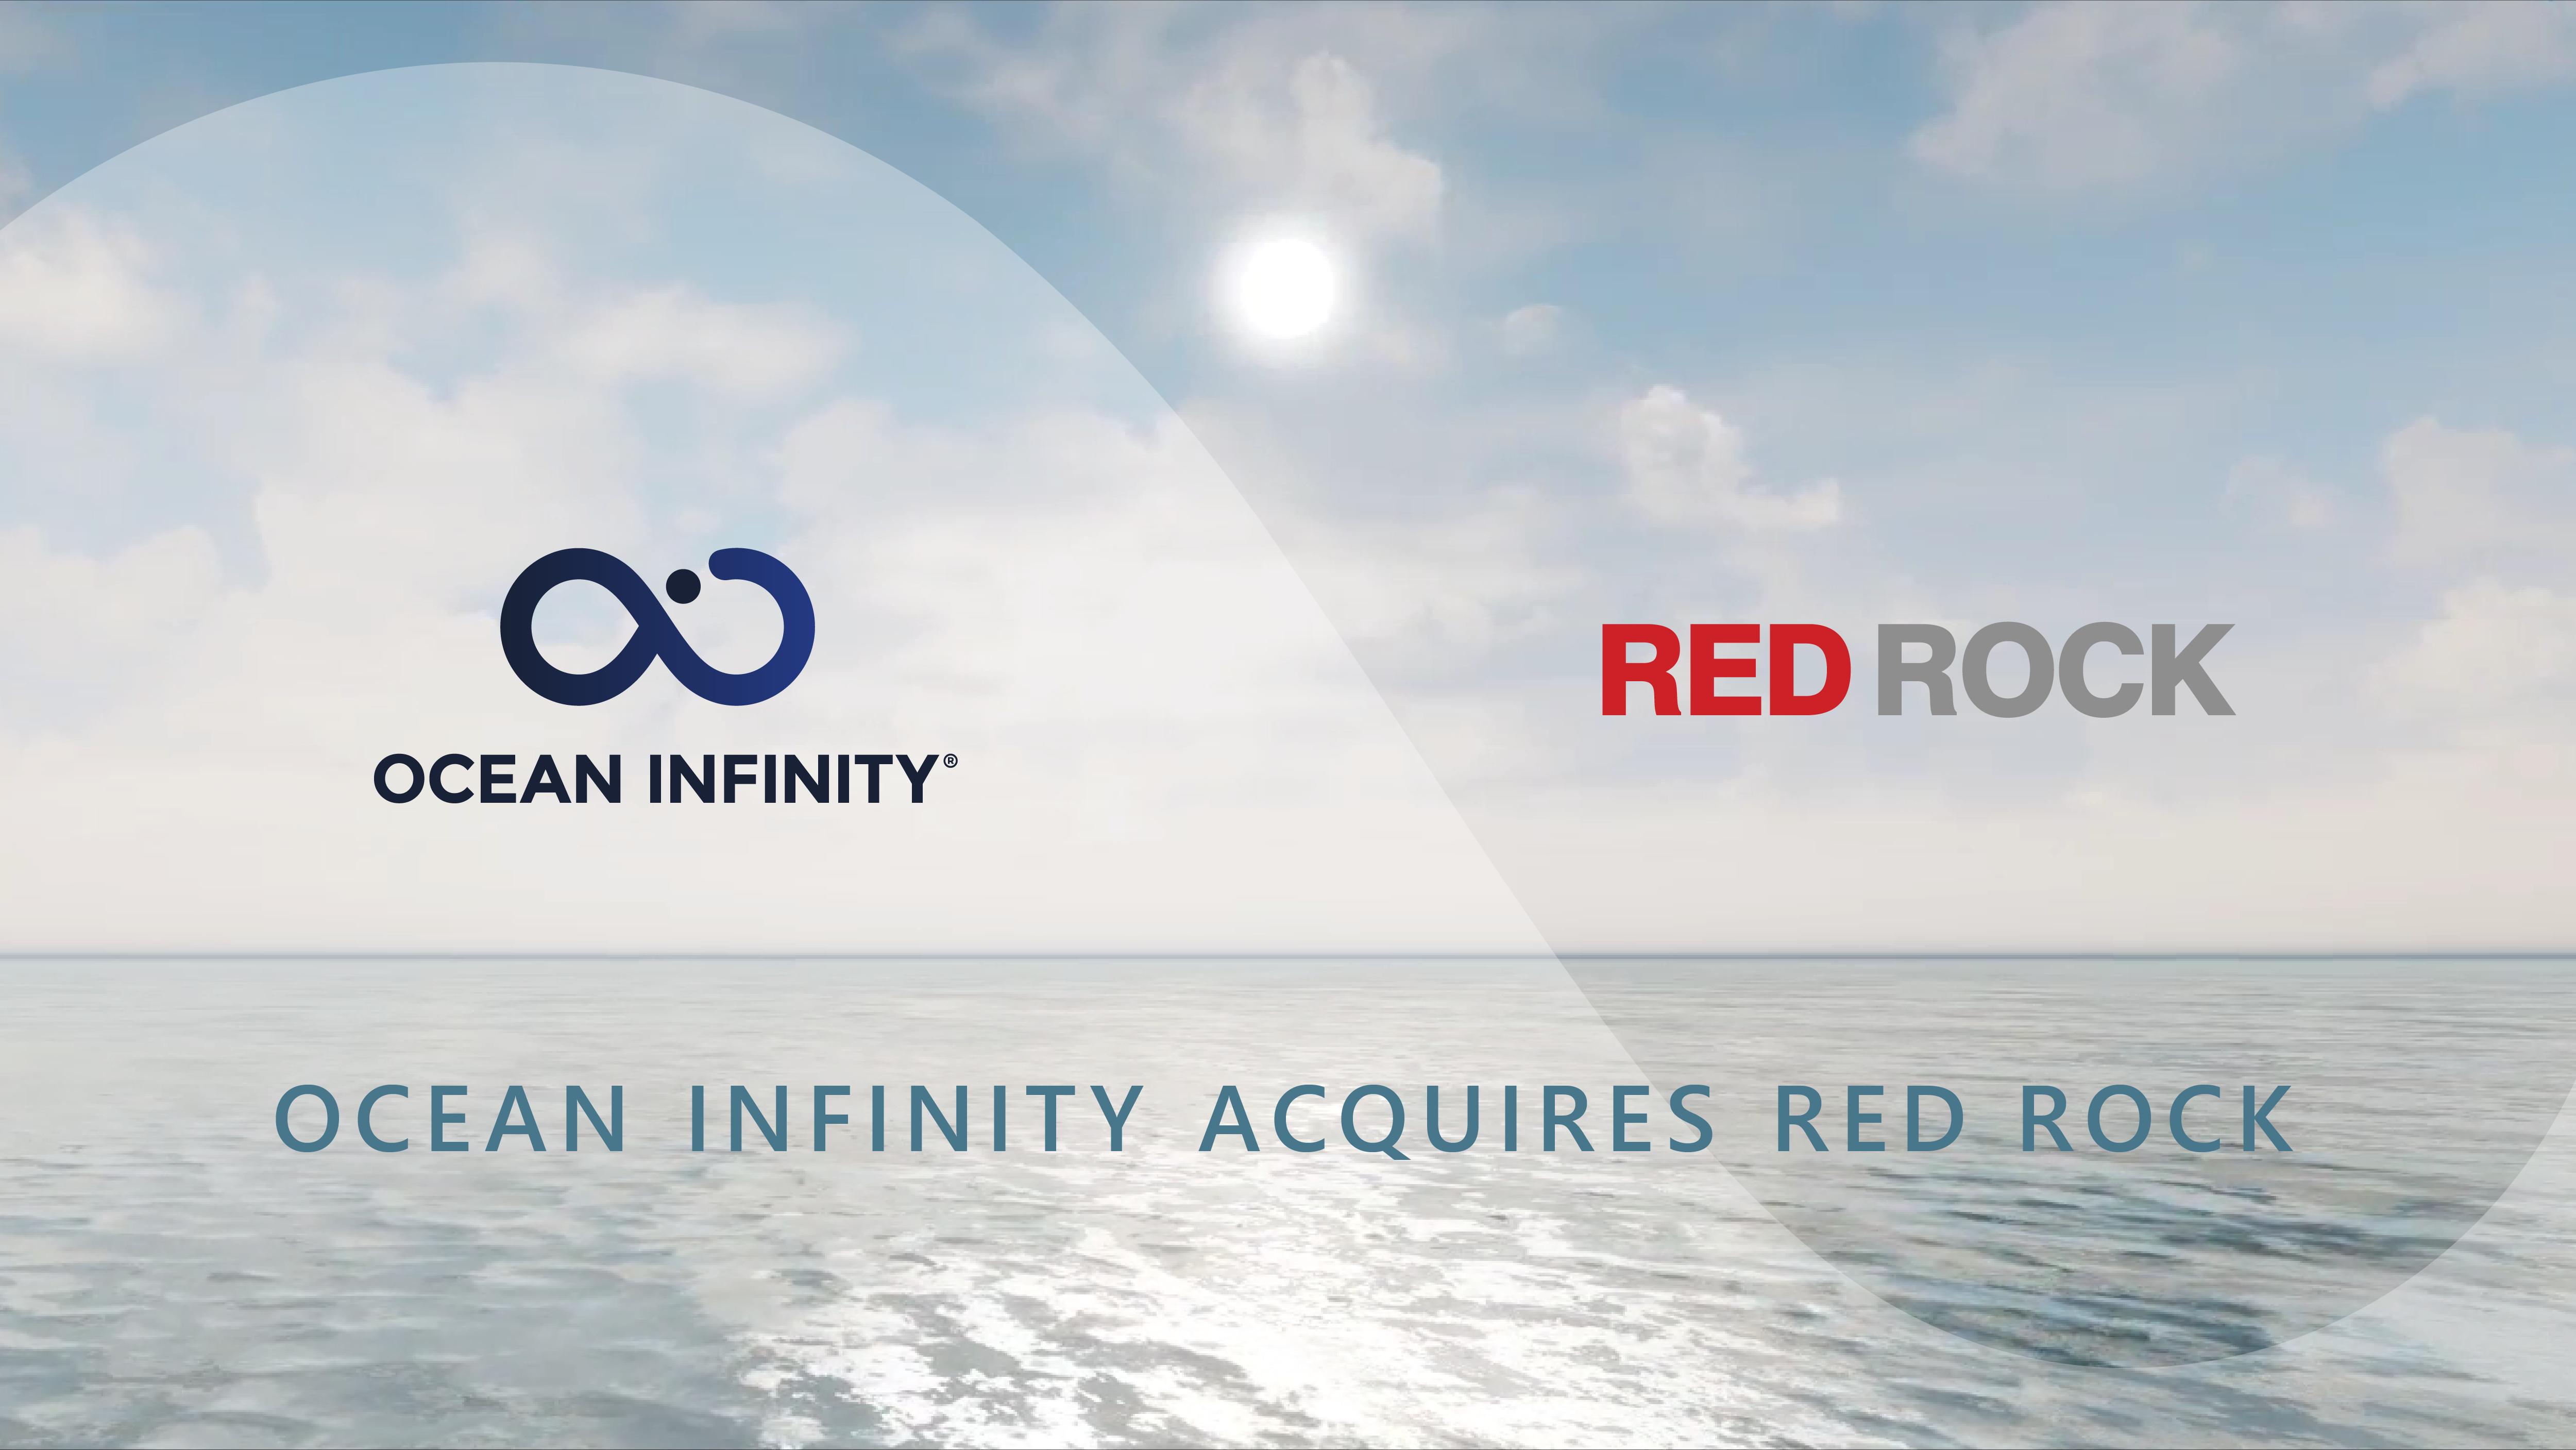 Ocean Infinity acquires Red Rock AS